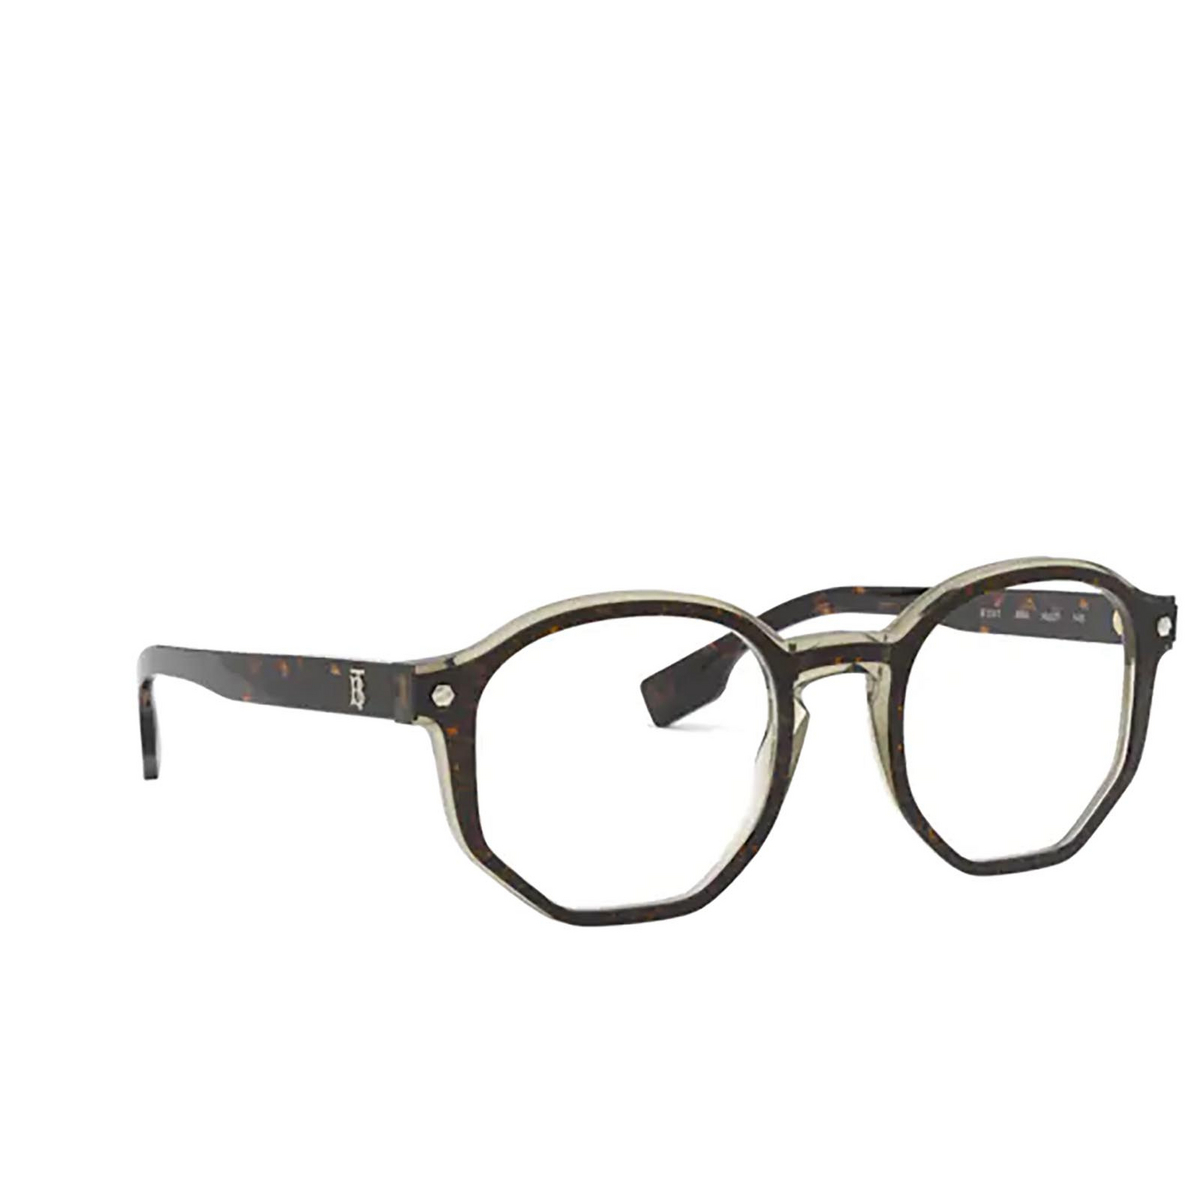 Burberry® Irregular Eyeglasses: Hogarth BE2317 color Top Havana On Grey Transparent 3660 - three-quarters view.